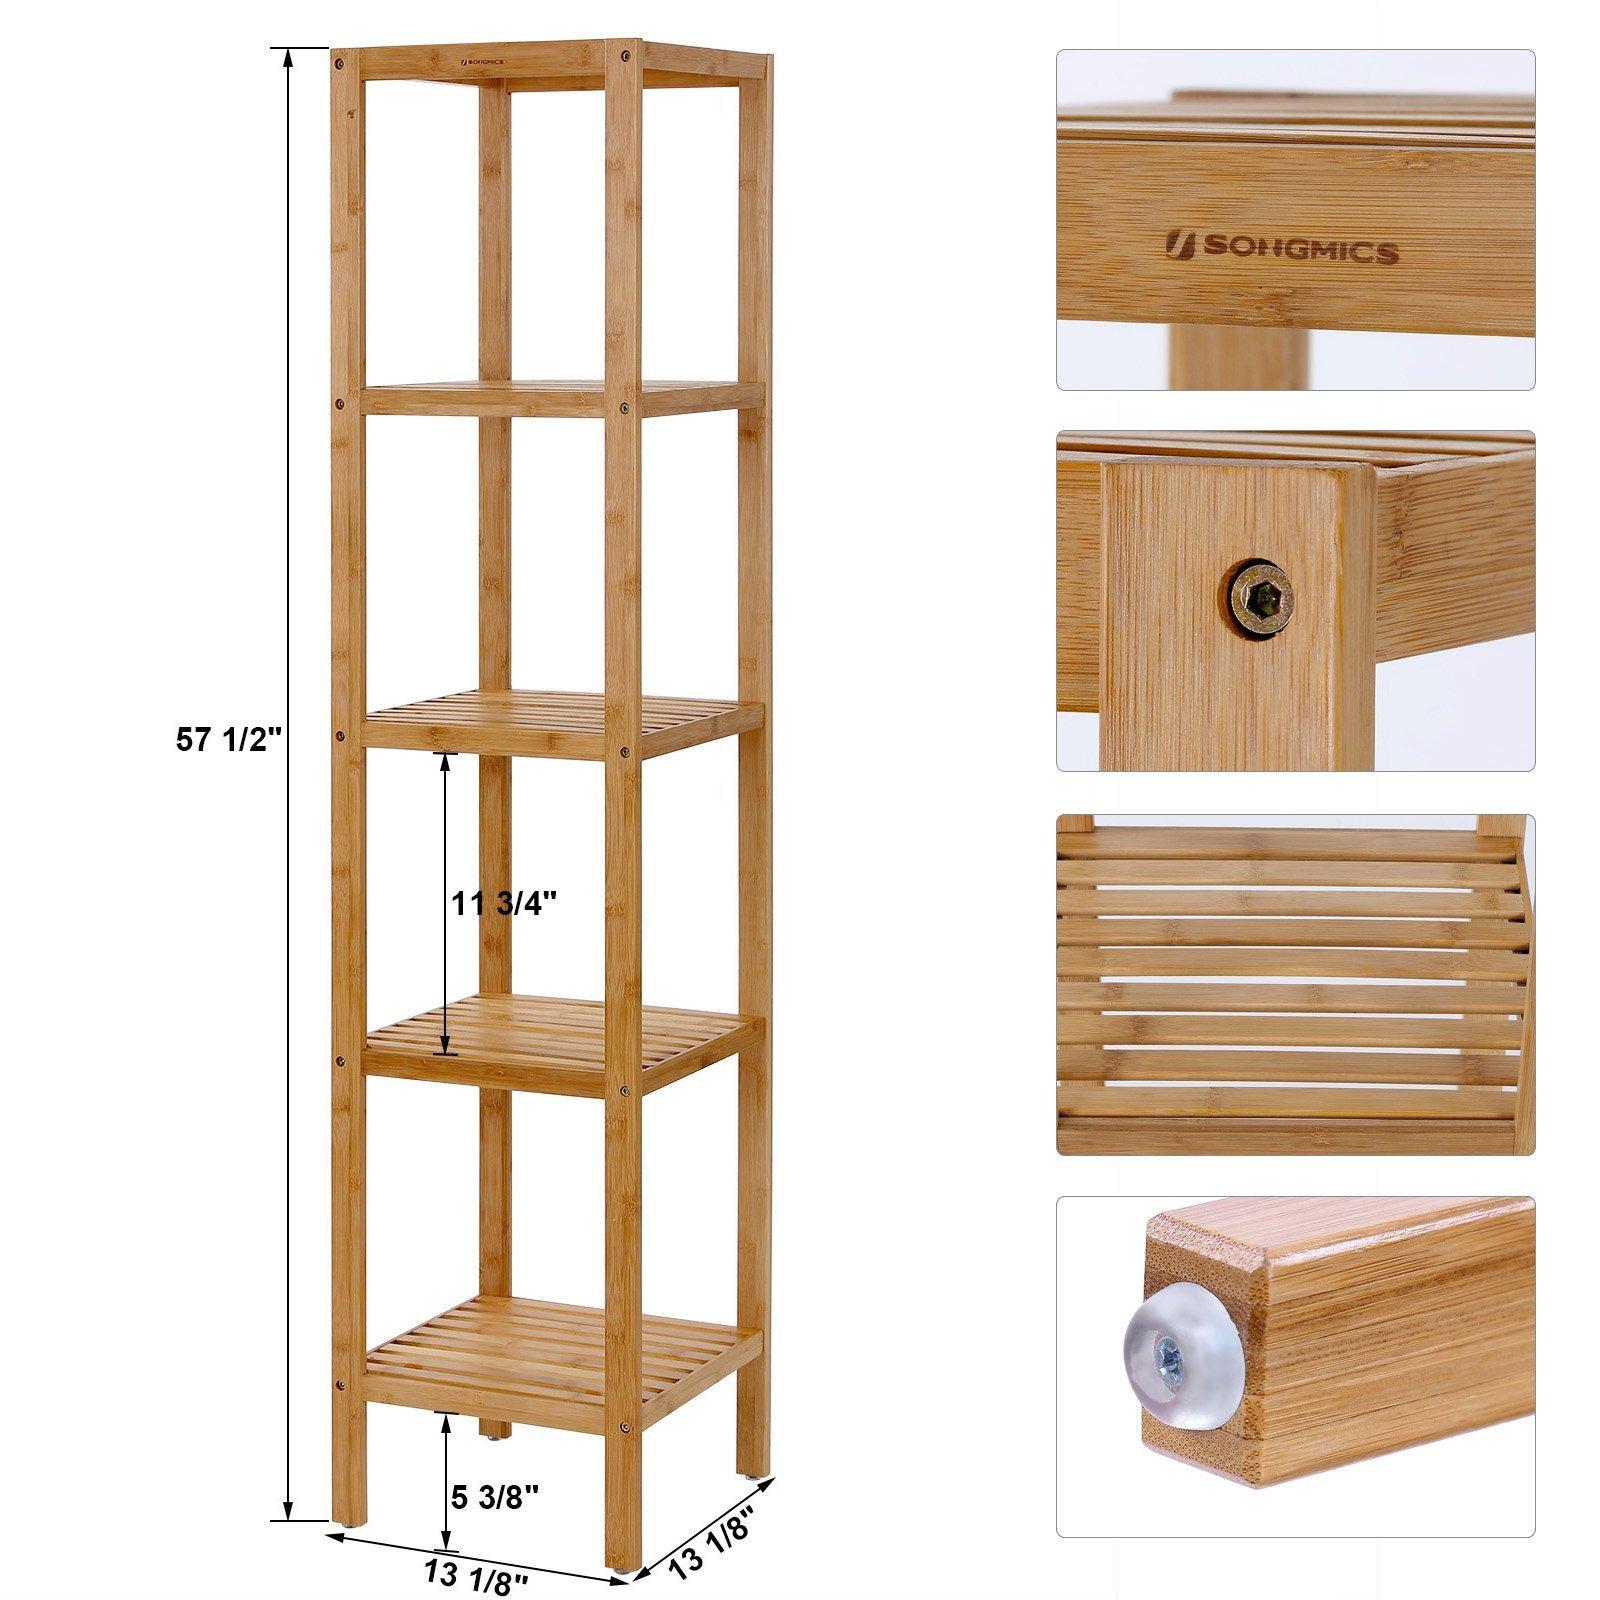 SONGMICS Narrow Shelving Unit Bathroom Shelf 5-Tier Multifunctional Storage 100% Bamboo Wood Corner Rack for Kitchen Livingroom Bedroom UBCB55Y by SONGMICS (Image #5)